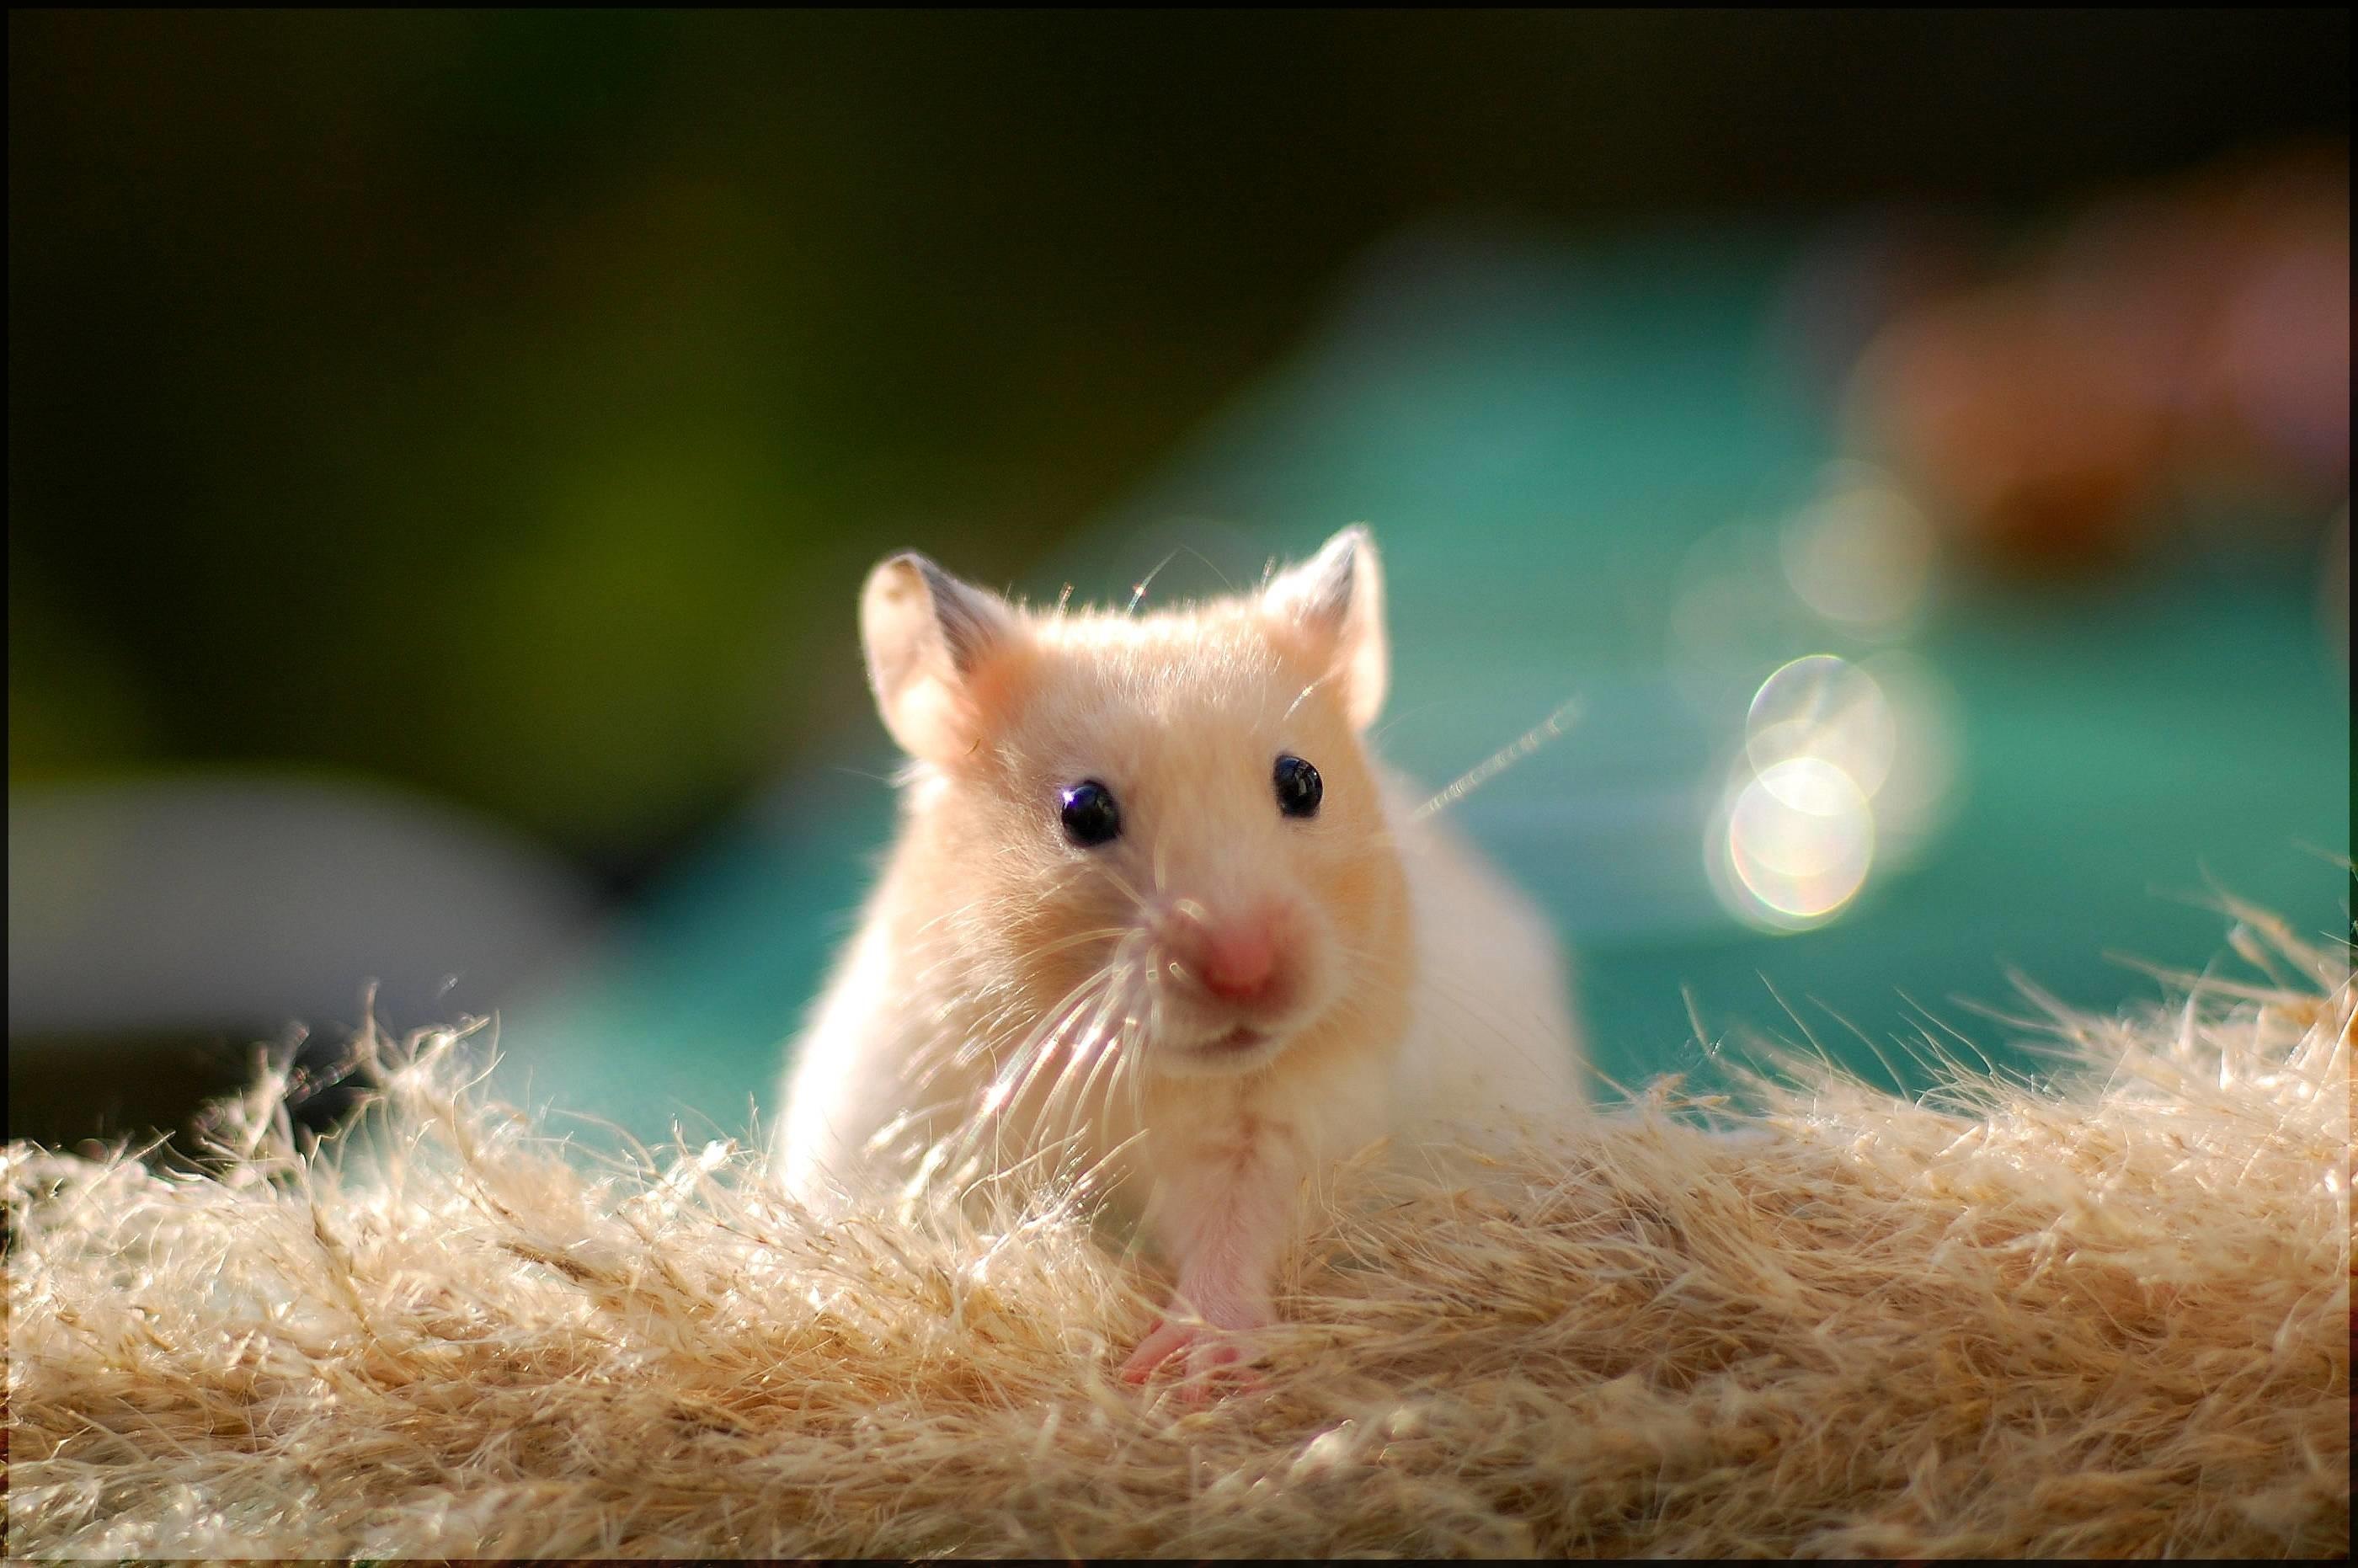 Cute Hamster Wallpaper Desktop #13155 Wallpaper   AWS HD Wallpapers